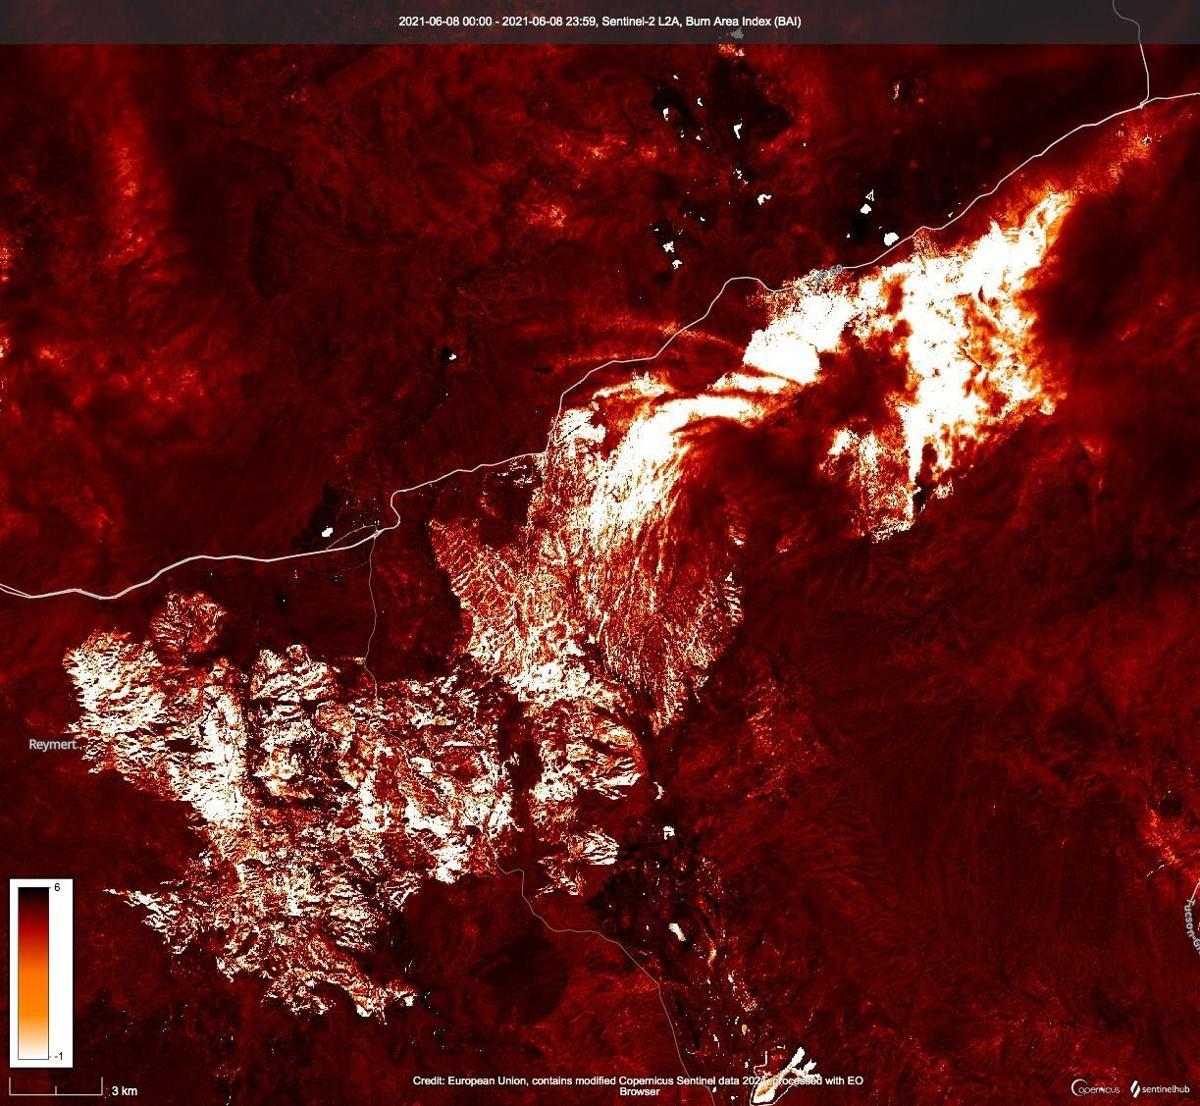 False color satellite image of Telegraph fire